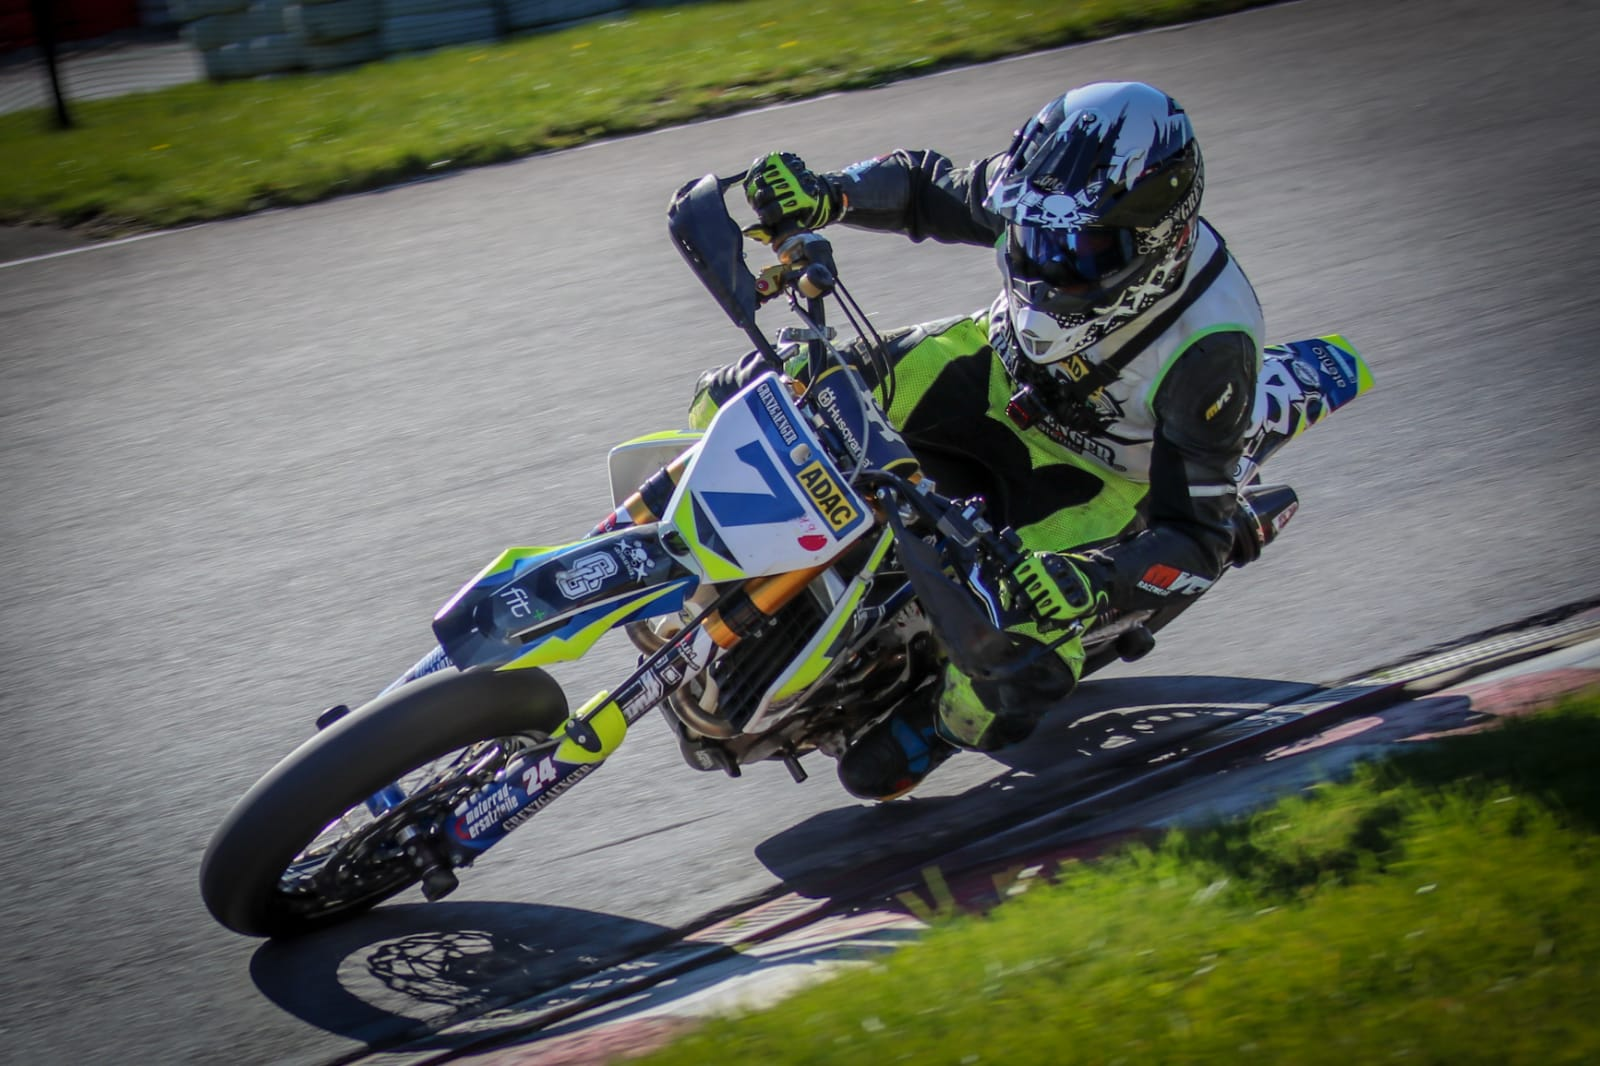 Braking Bremsbelag-Test in Spa - Supermoto